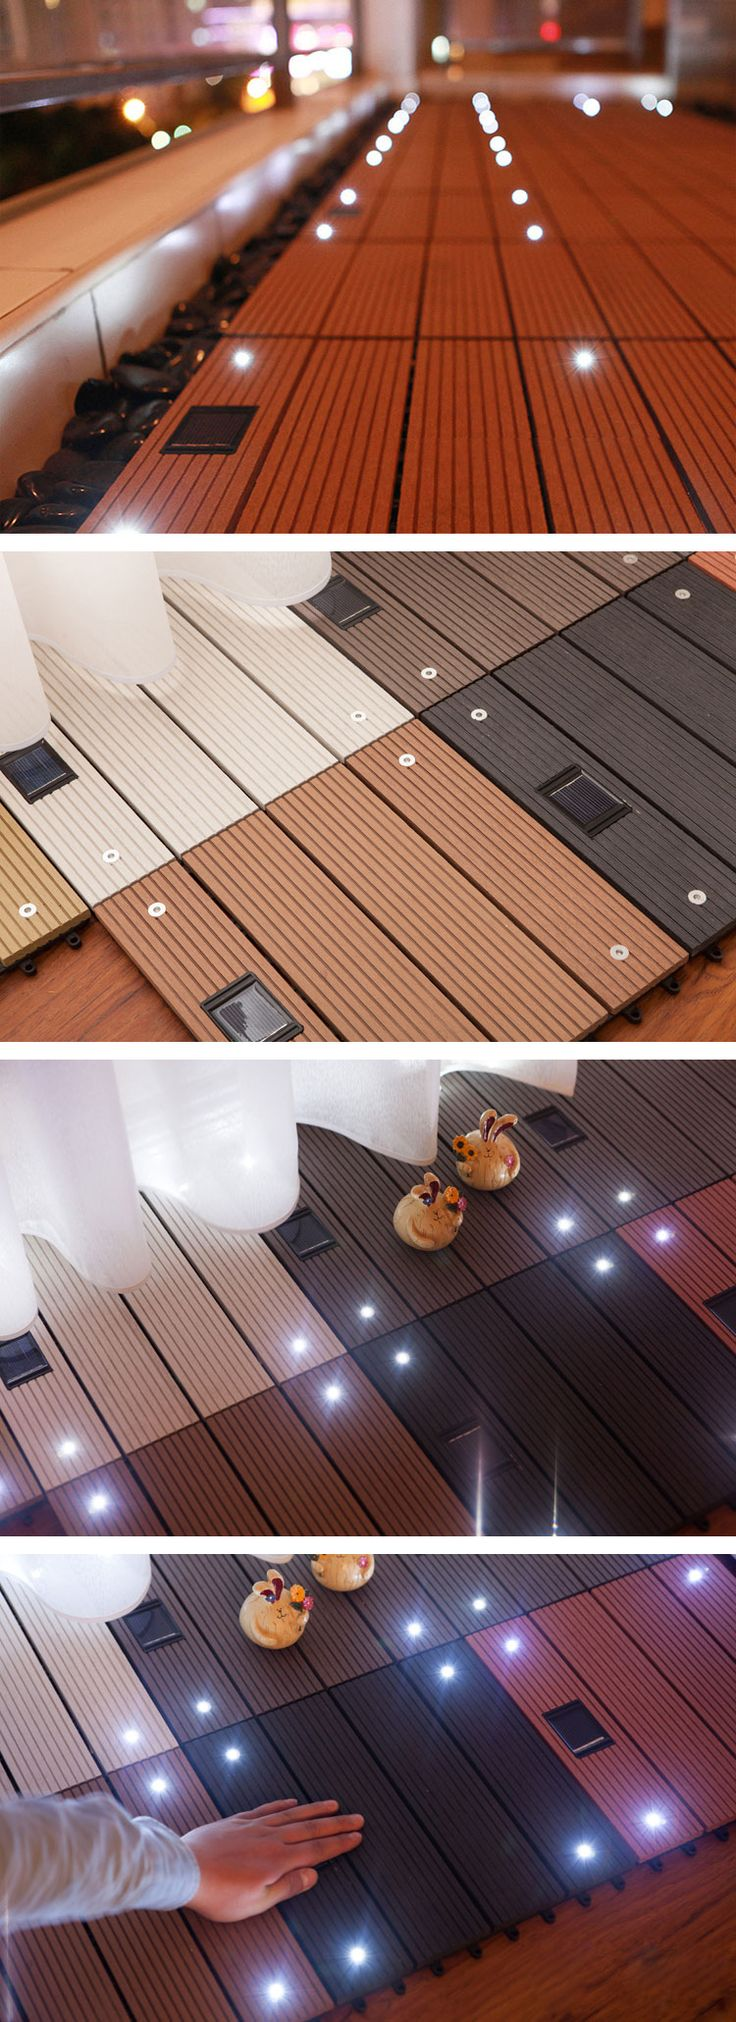 Wood Plastic Composite Flooring with Solar Light Outdoor Garden Balcony Interlocking Decking Tile